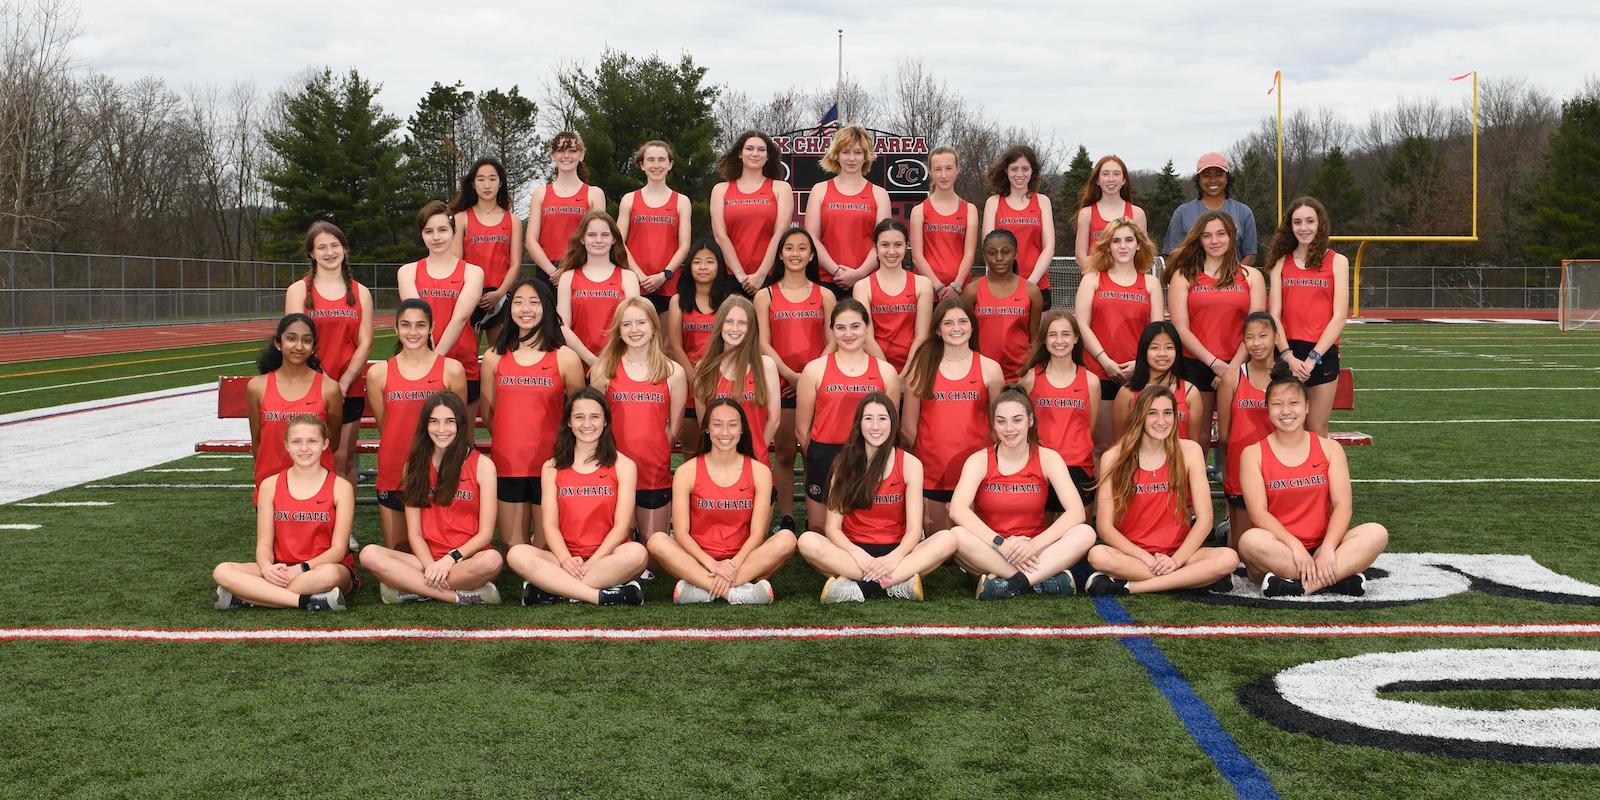 Girls' track team